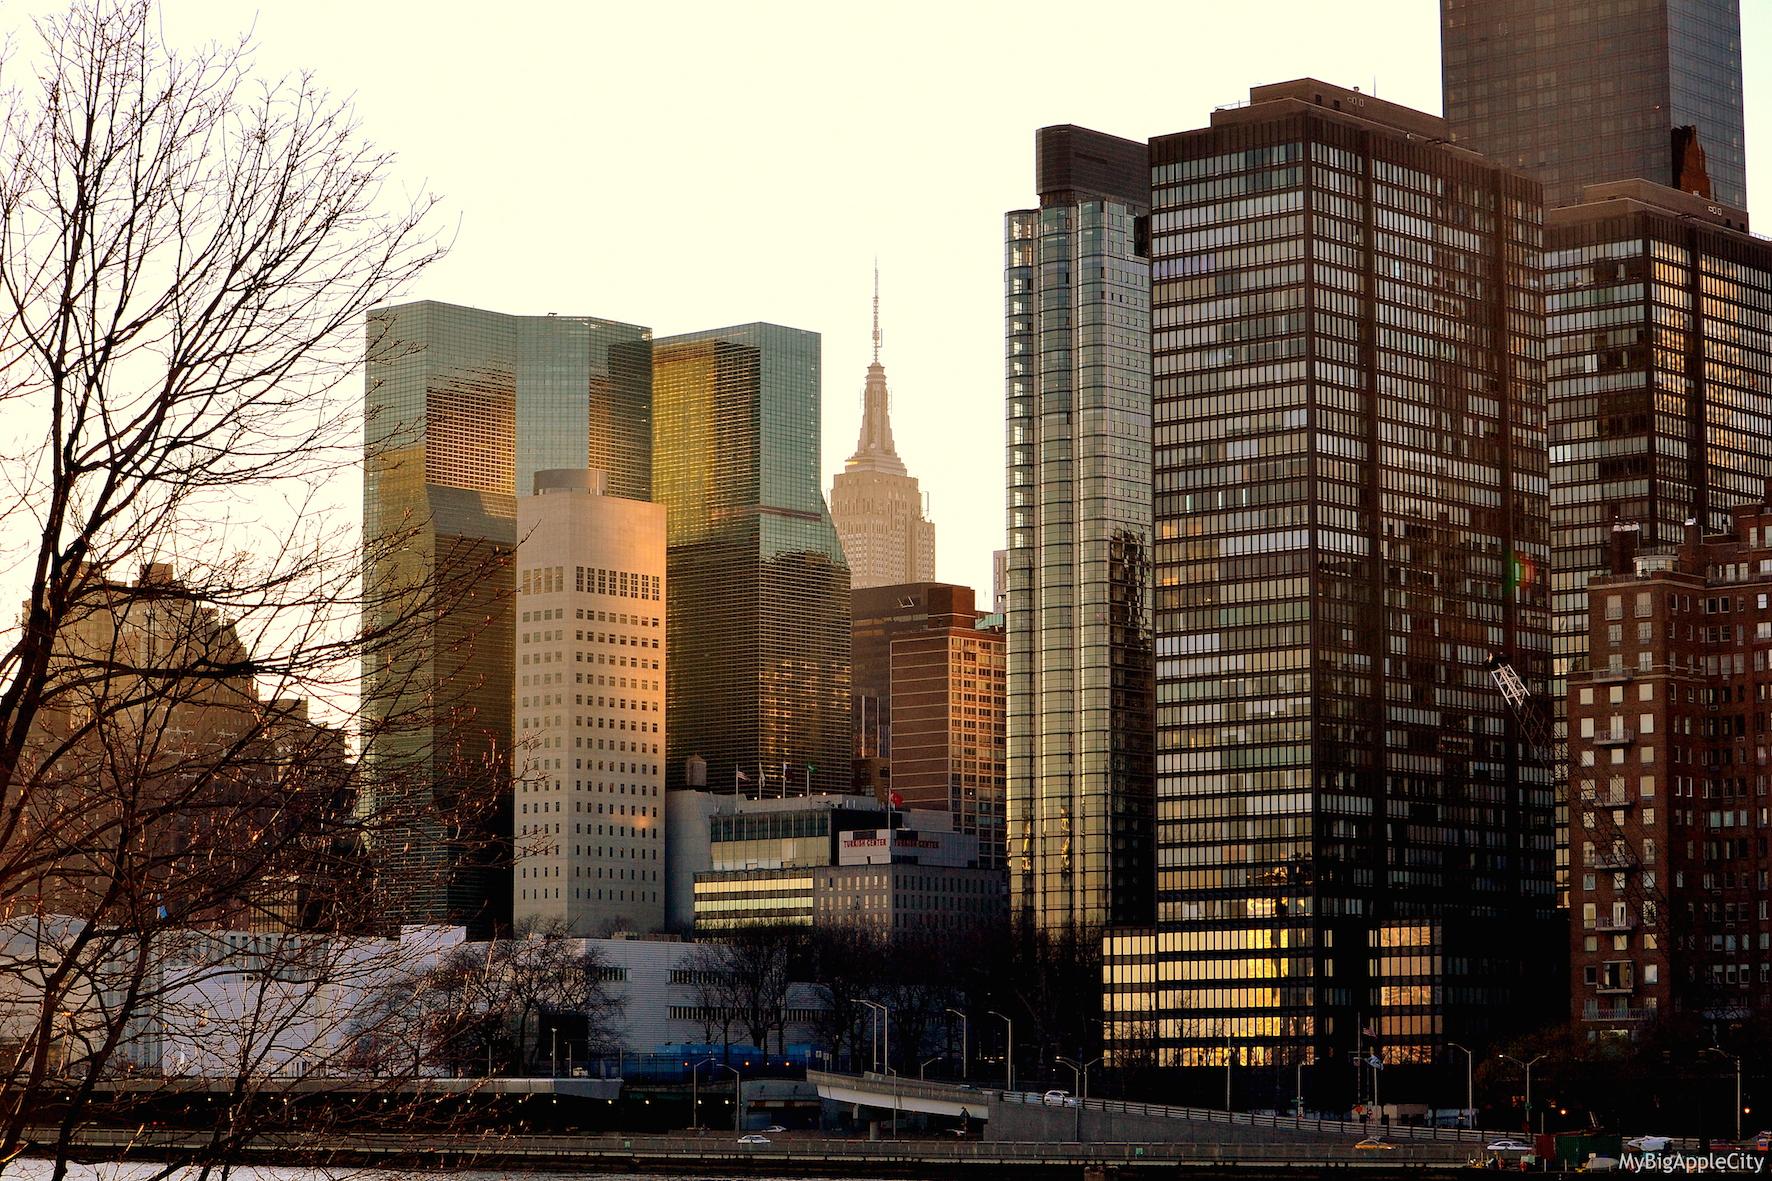 MyBigAppleCity-travel-newyork-Roosevelt-Island-blog